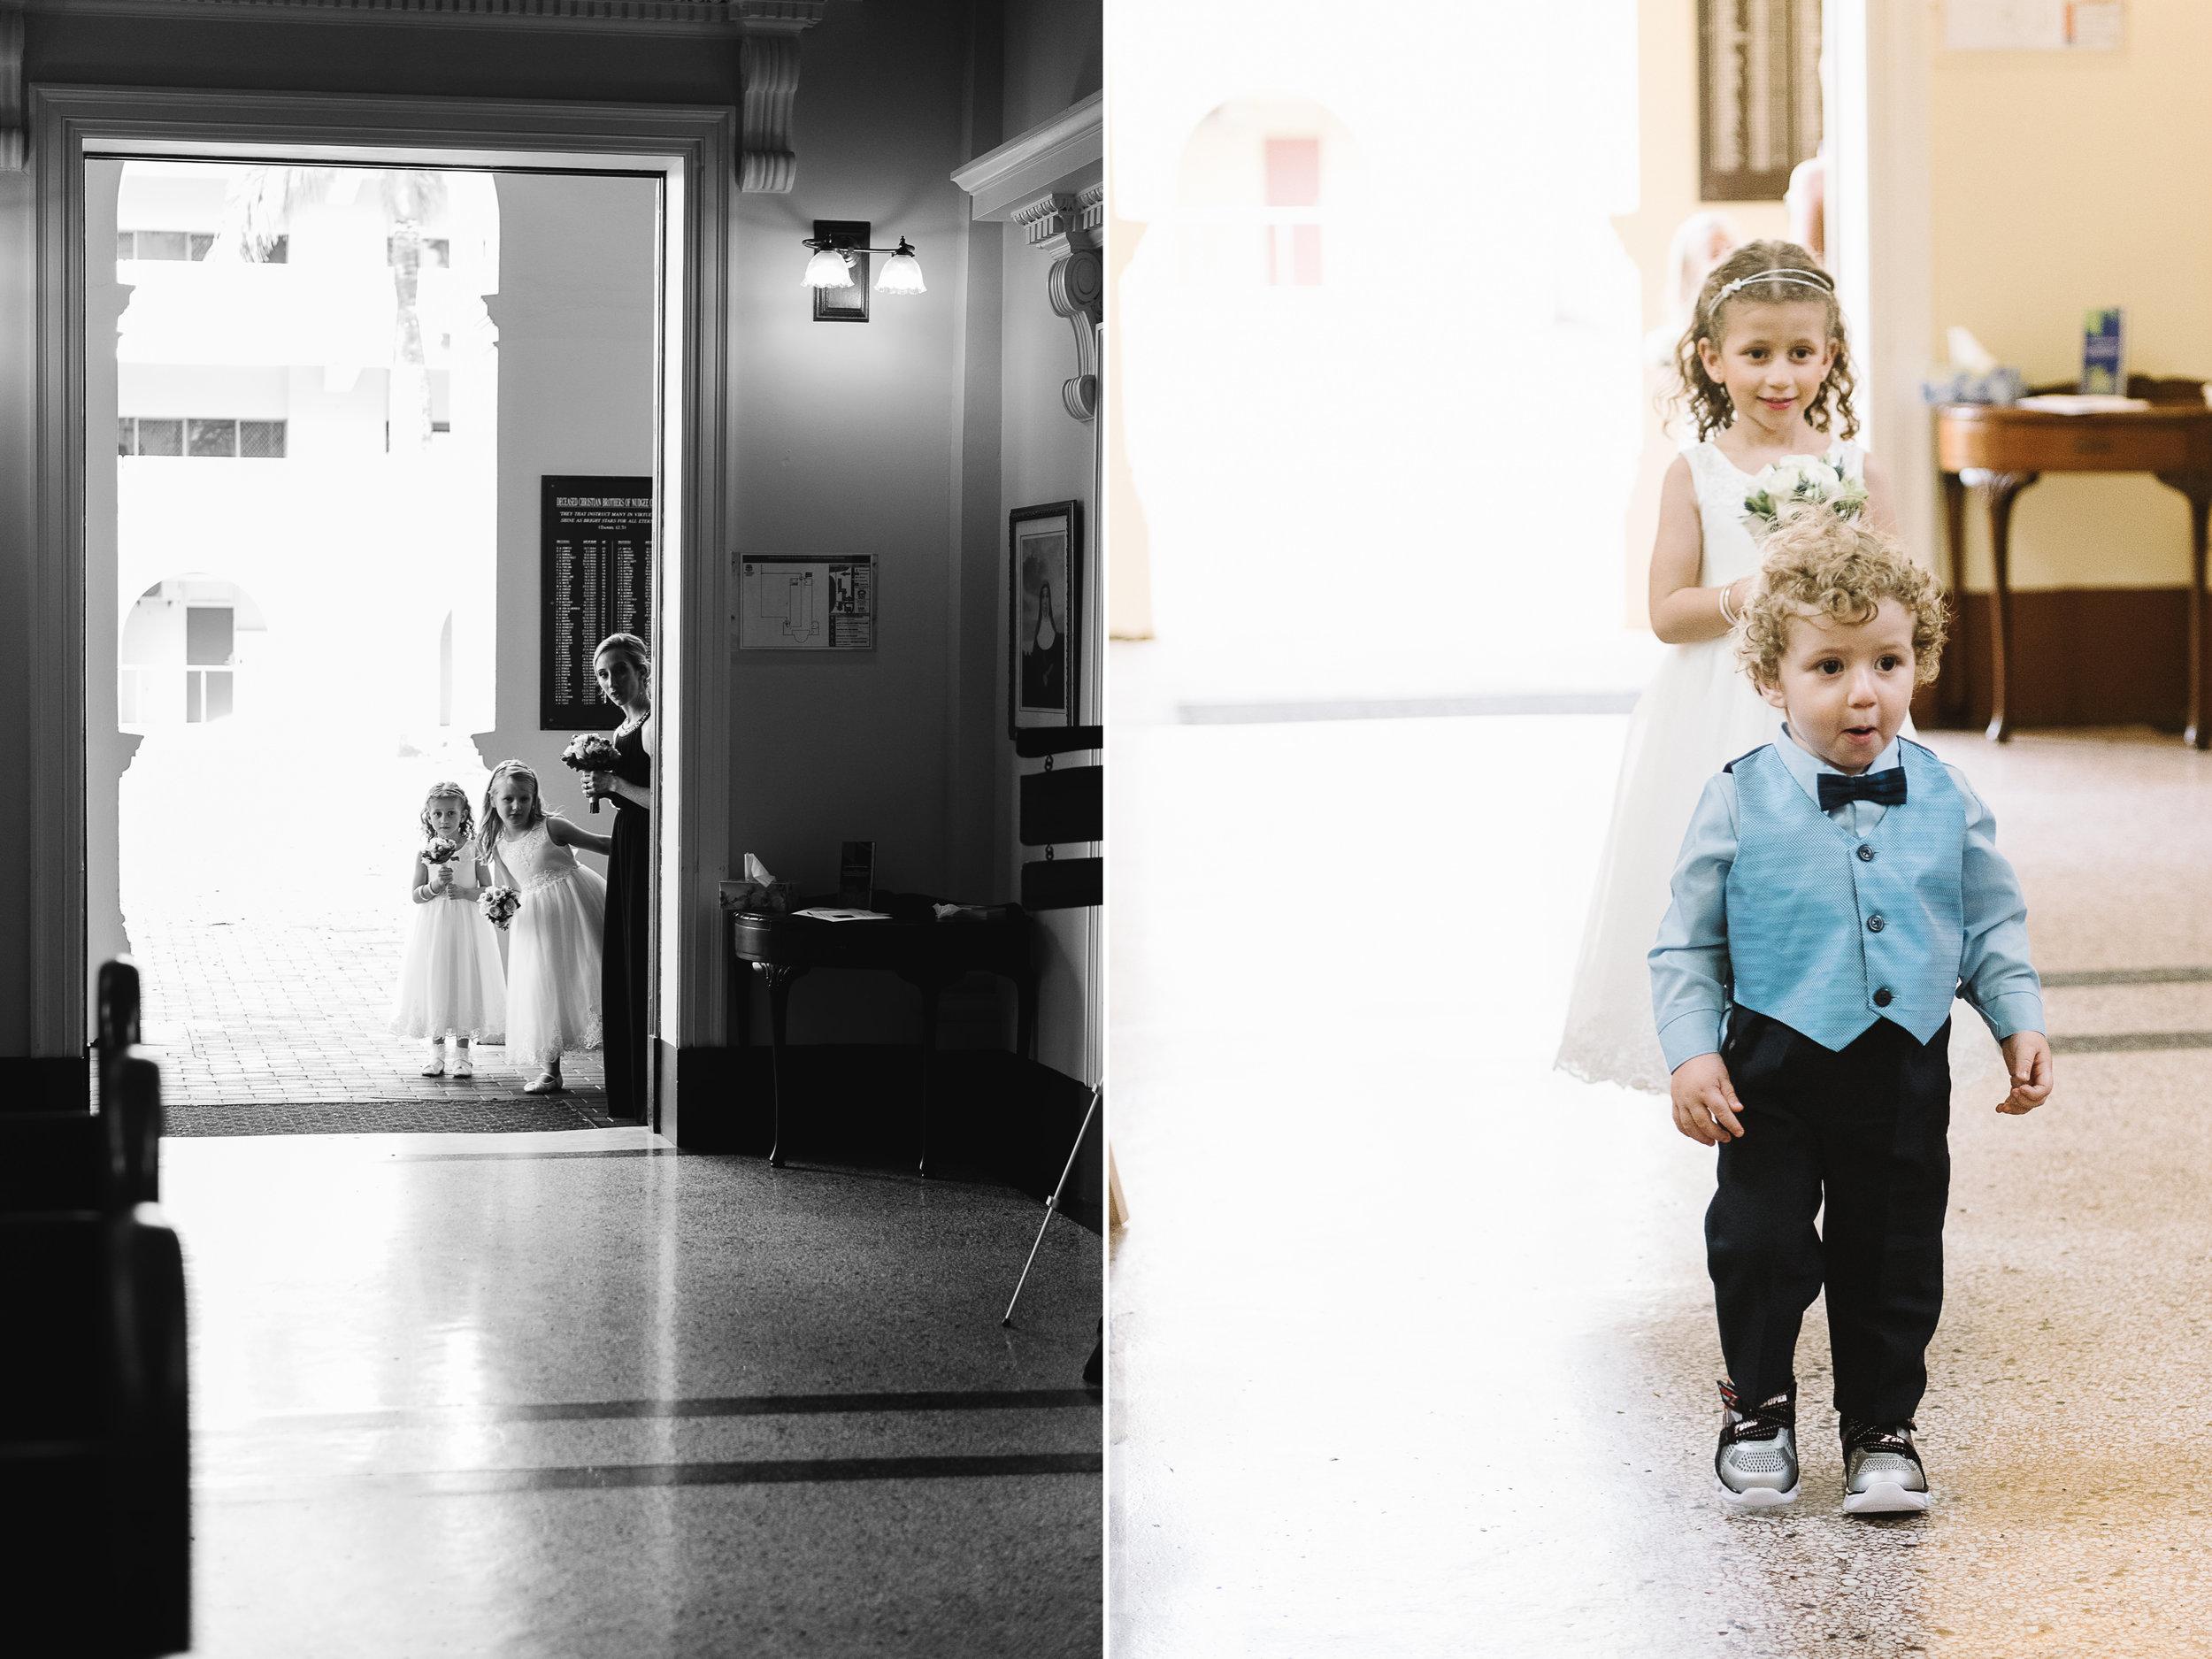 nudgee-college-wedding-17.jpg